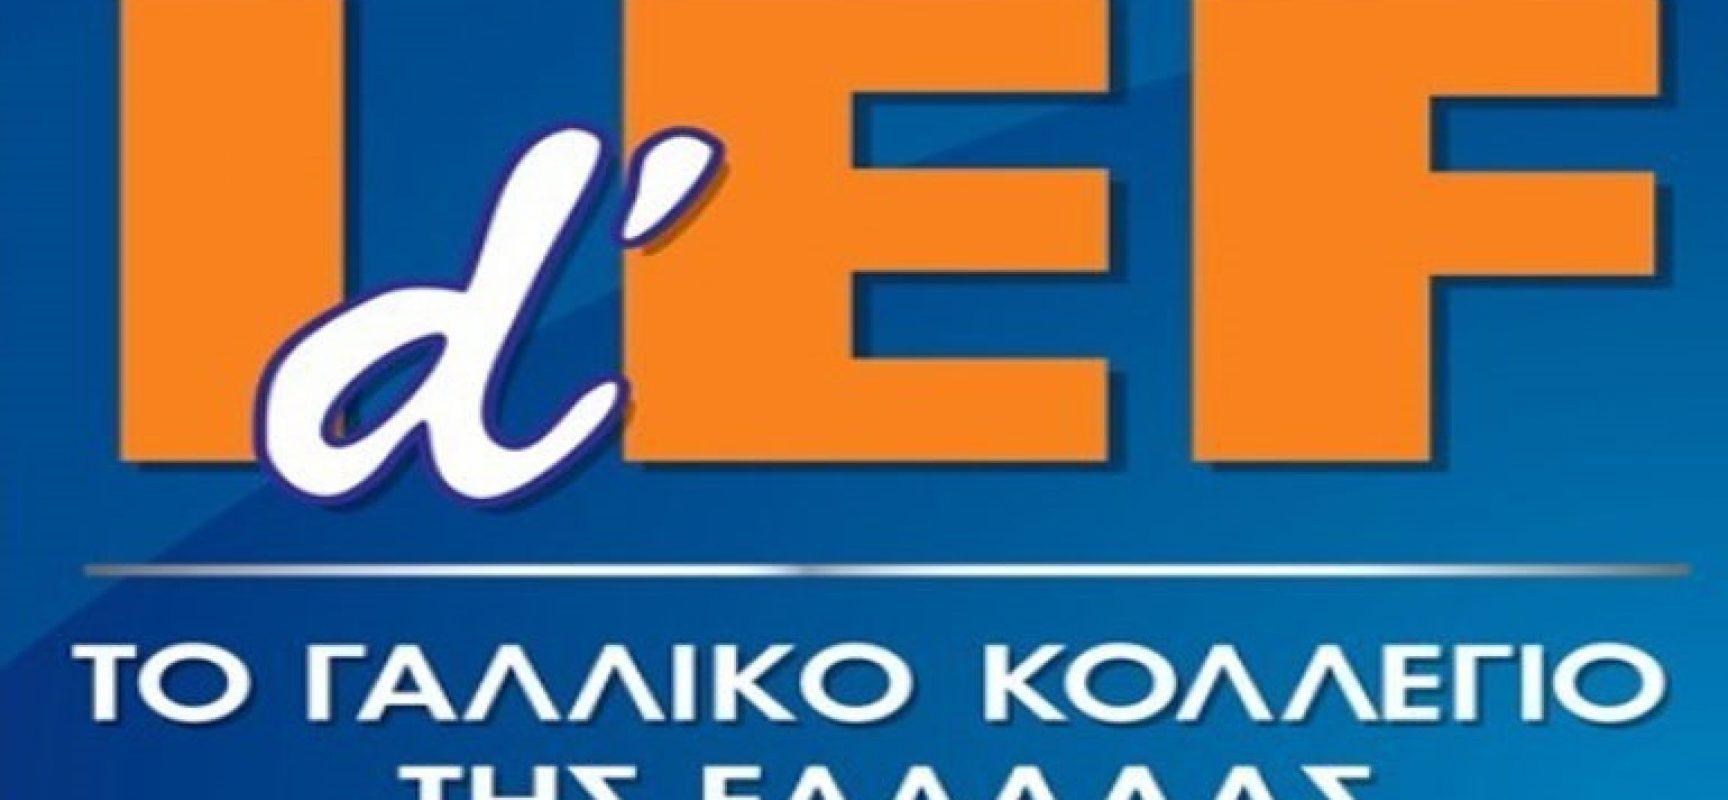 Yποβολή αιτήσεων Υποτροφιών του Γαλλικού Κολλεγίου Ελλάδος – IdEF